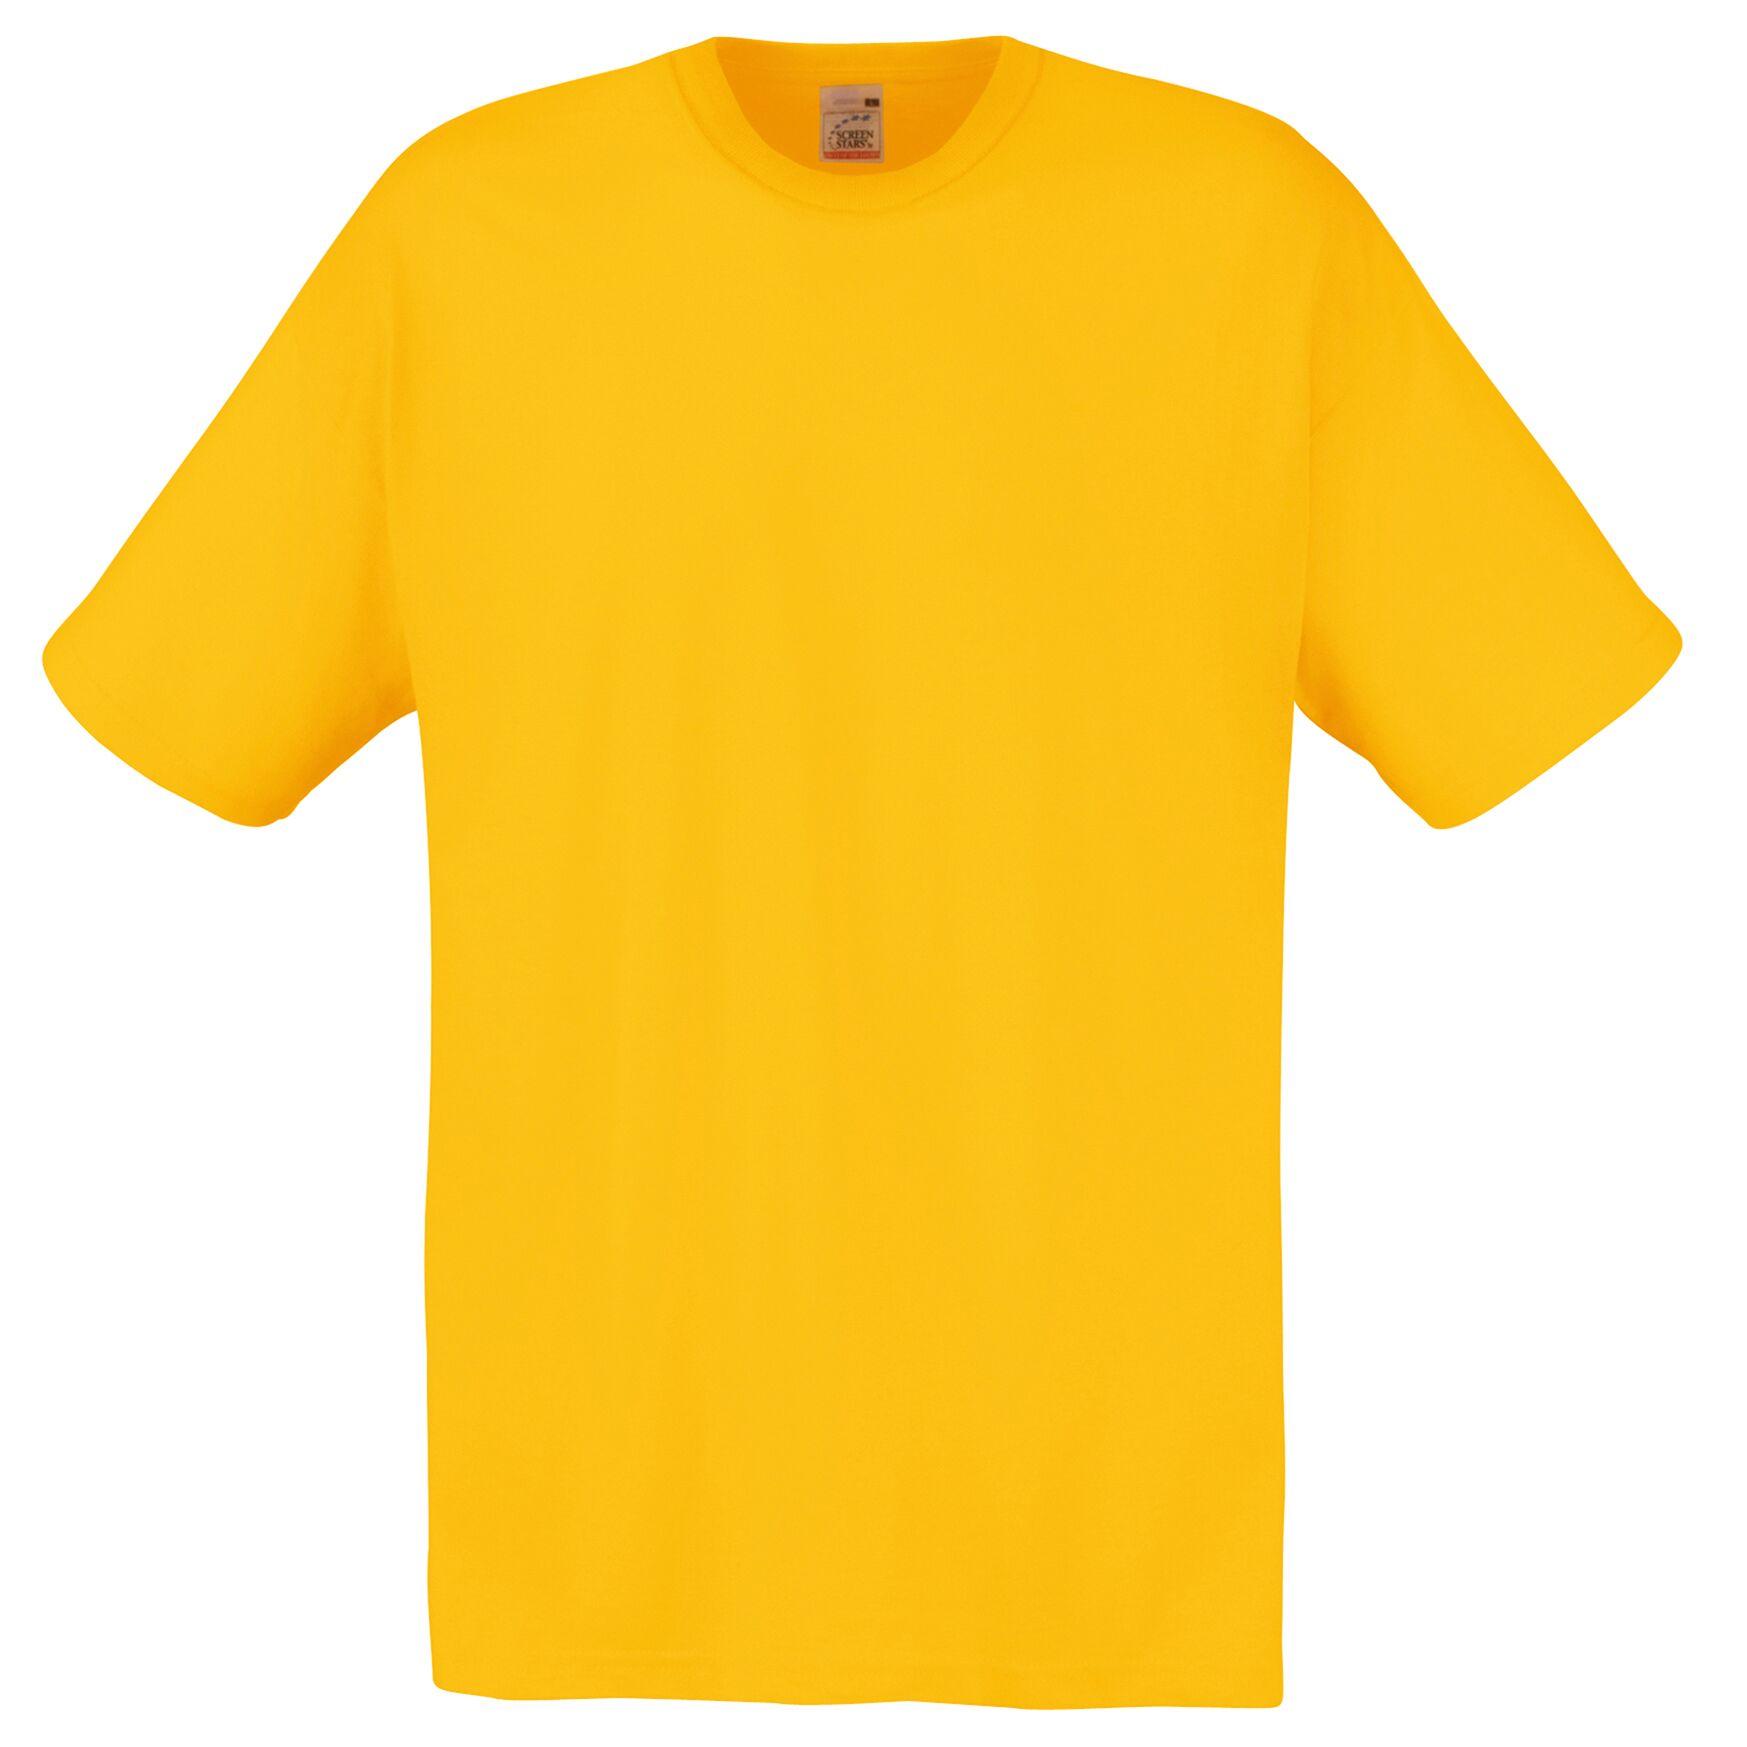 St.Hilary's Nursery T - Shirt (Multiple Colours)